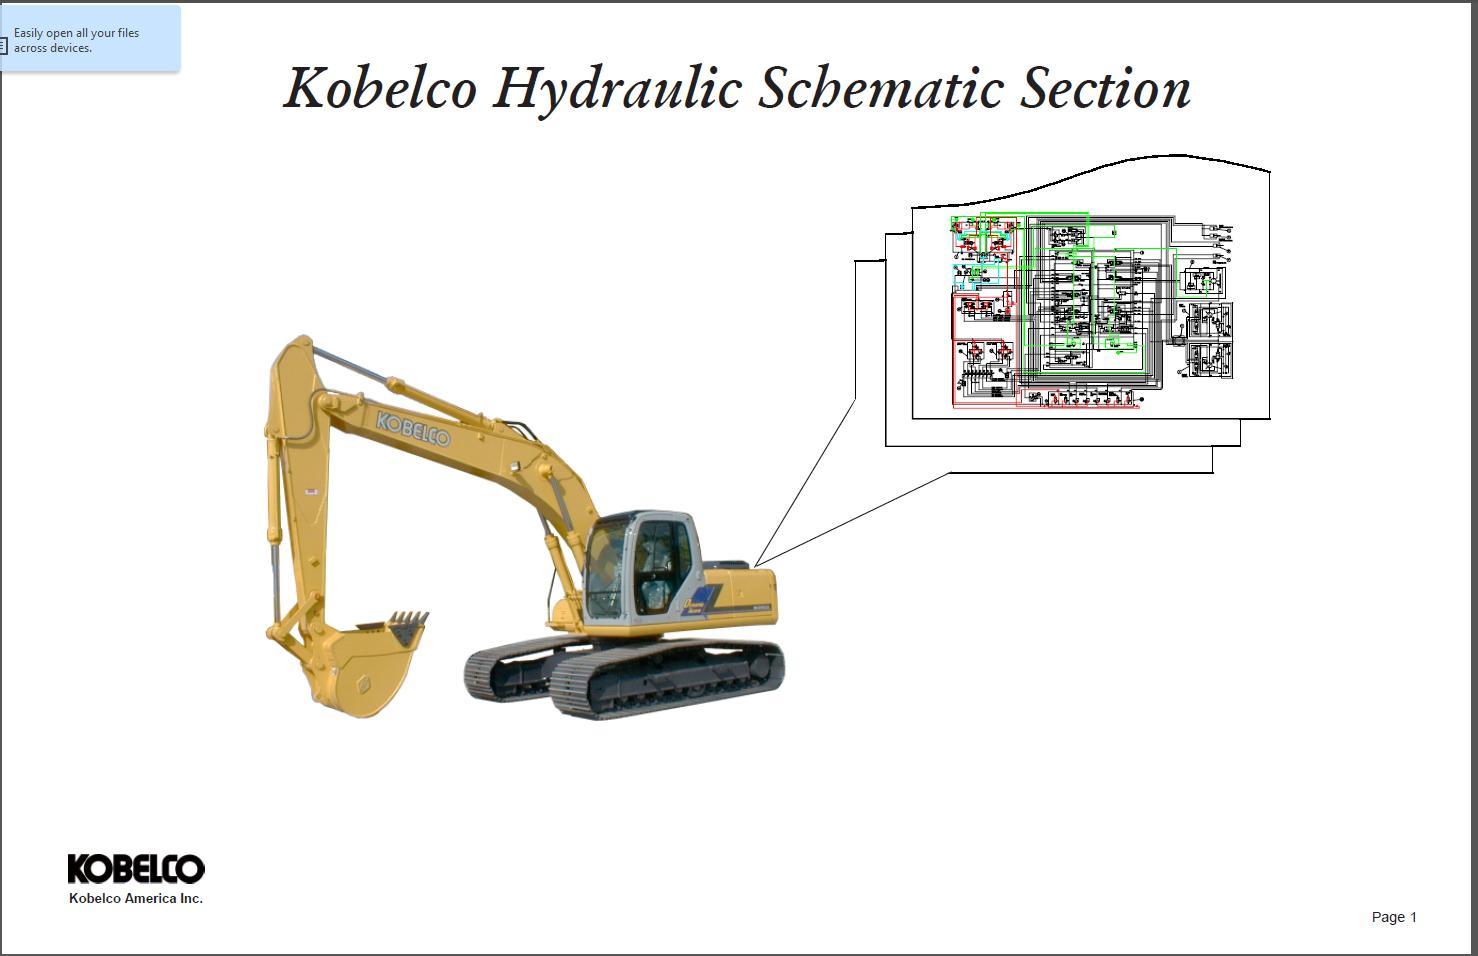 Kobelco_Construction_Machinery_New_Models_Service_Manuals_DVD1